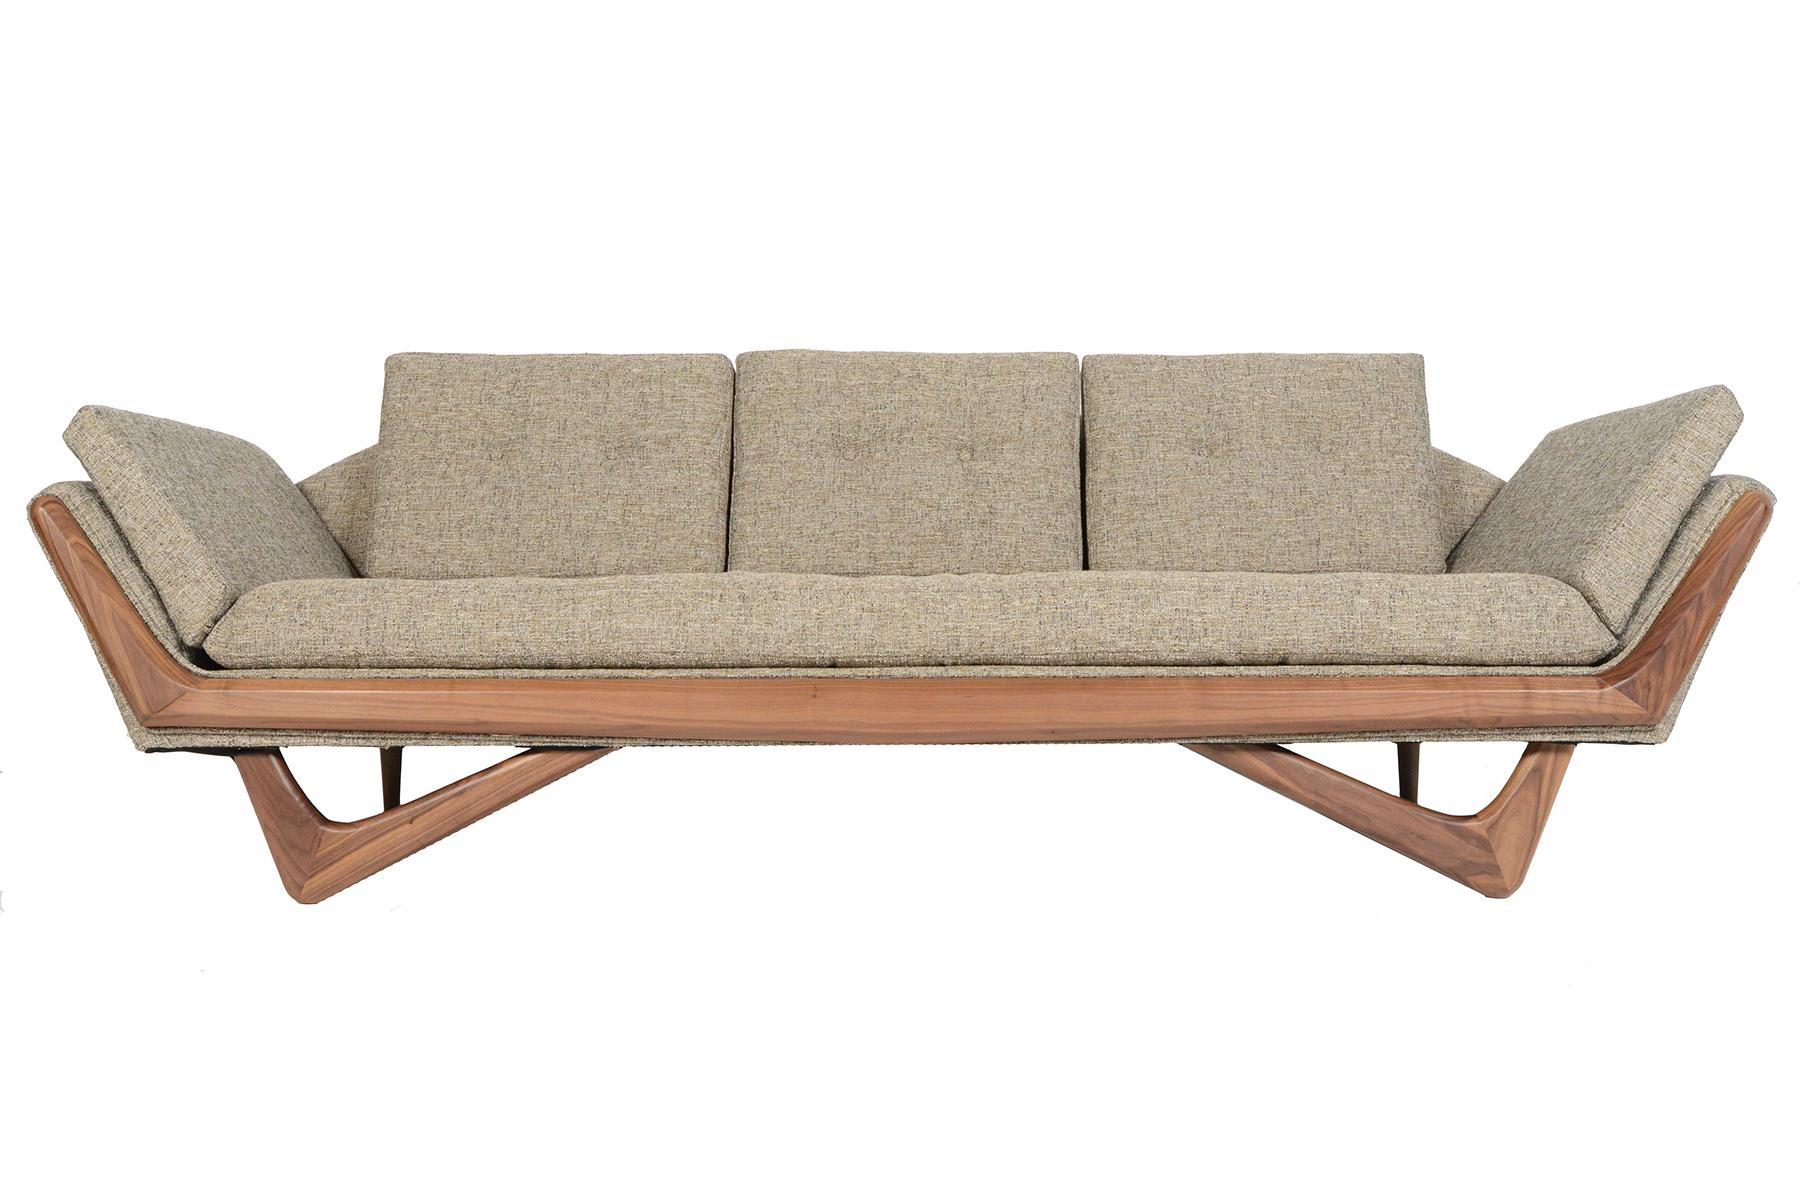 mid century style streamline sofa in walnut chairish. Black Bedroom Furniture Sets. Home Design Ideas